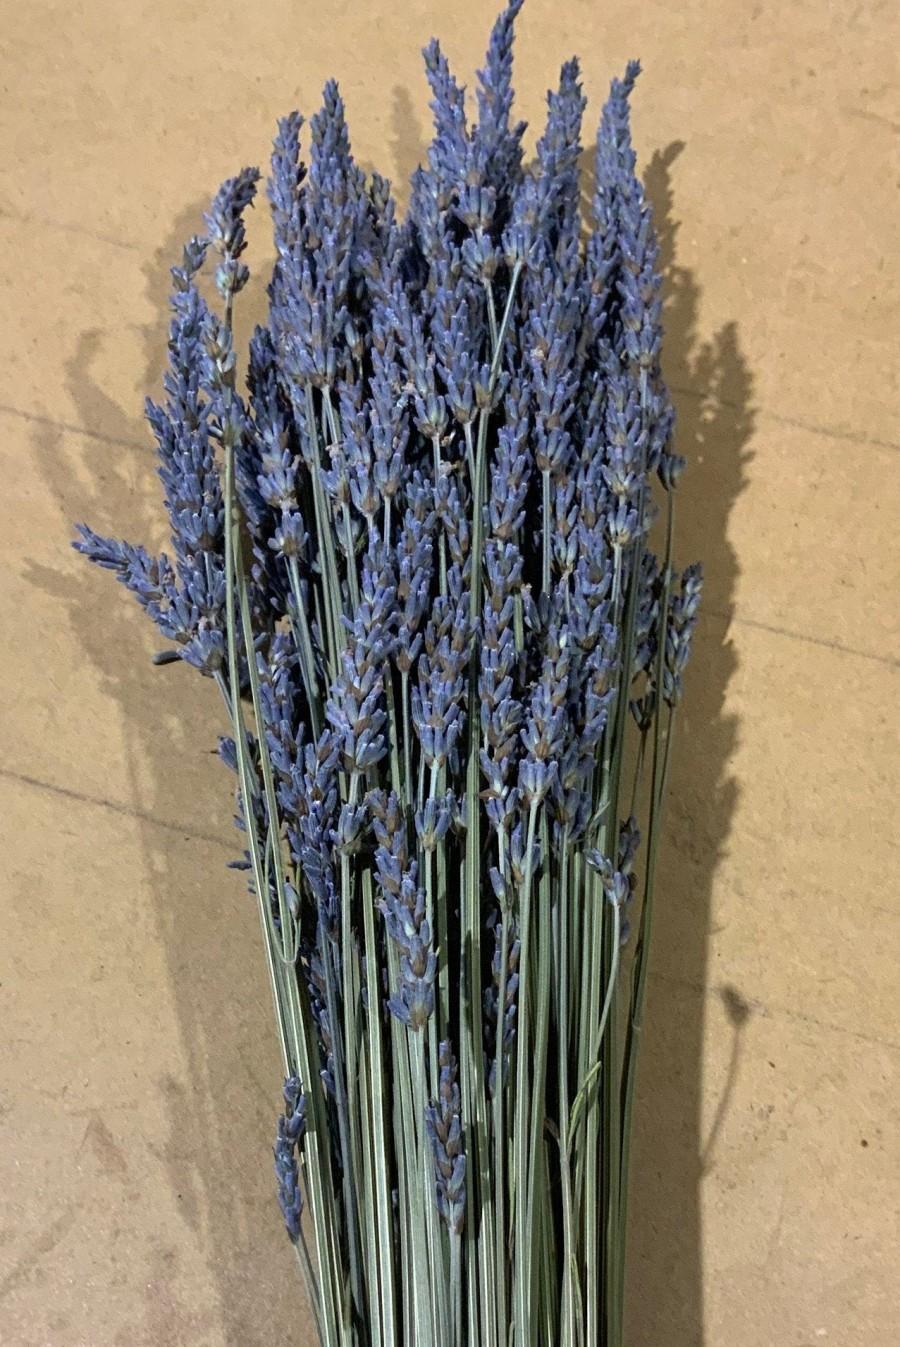 Свадьба - SALE 2020 Lavender 5oz Dried bunches 400 Stems bundle Fragrant bouquets, crafts weddings Grosso English bundle best seller weddings